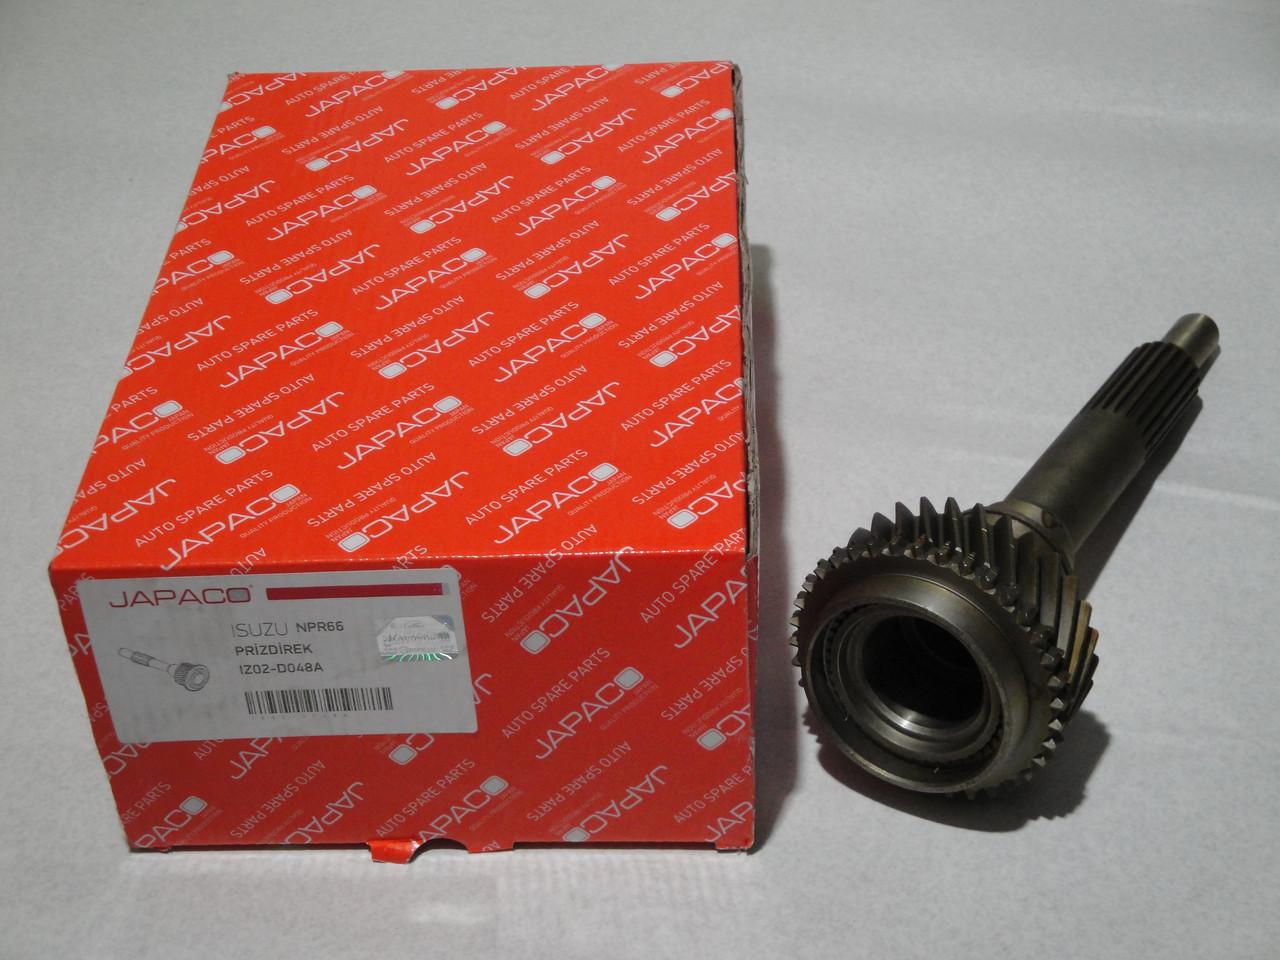 Вал первинний КПП ISUZU БОГДАН A091/A092 MXA5R S=21 (8971689800/8970348480) ENGINE MASTER